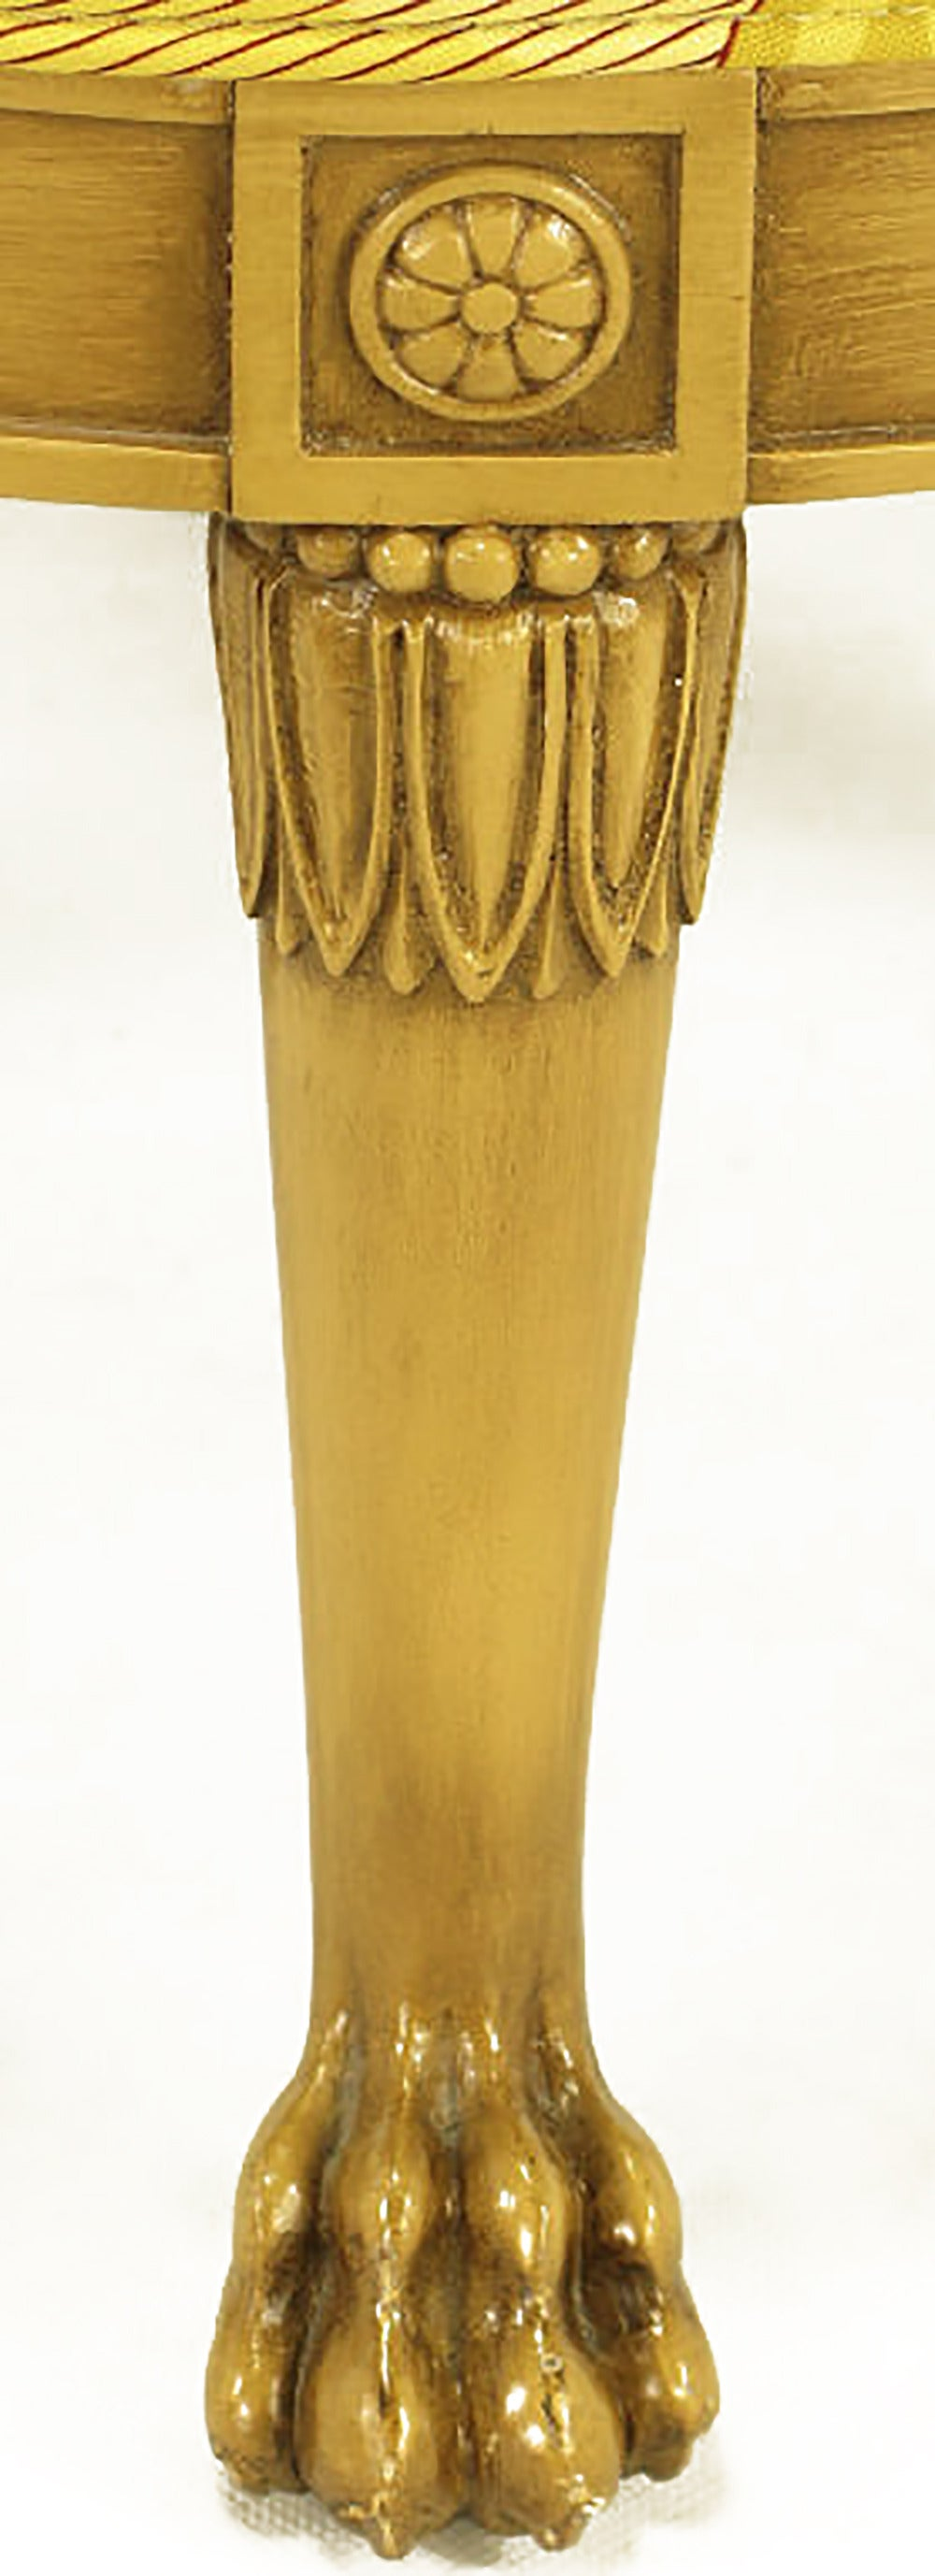 Round Lion's Paw Glazed Mahogany and Saffron Silk Empire Style Ottoman For Sale 1